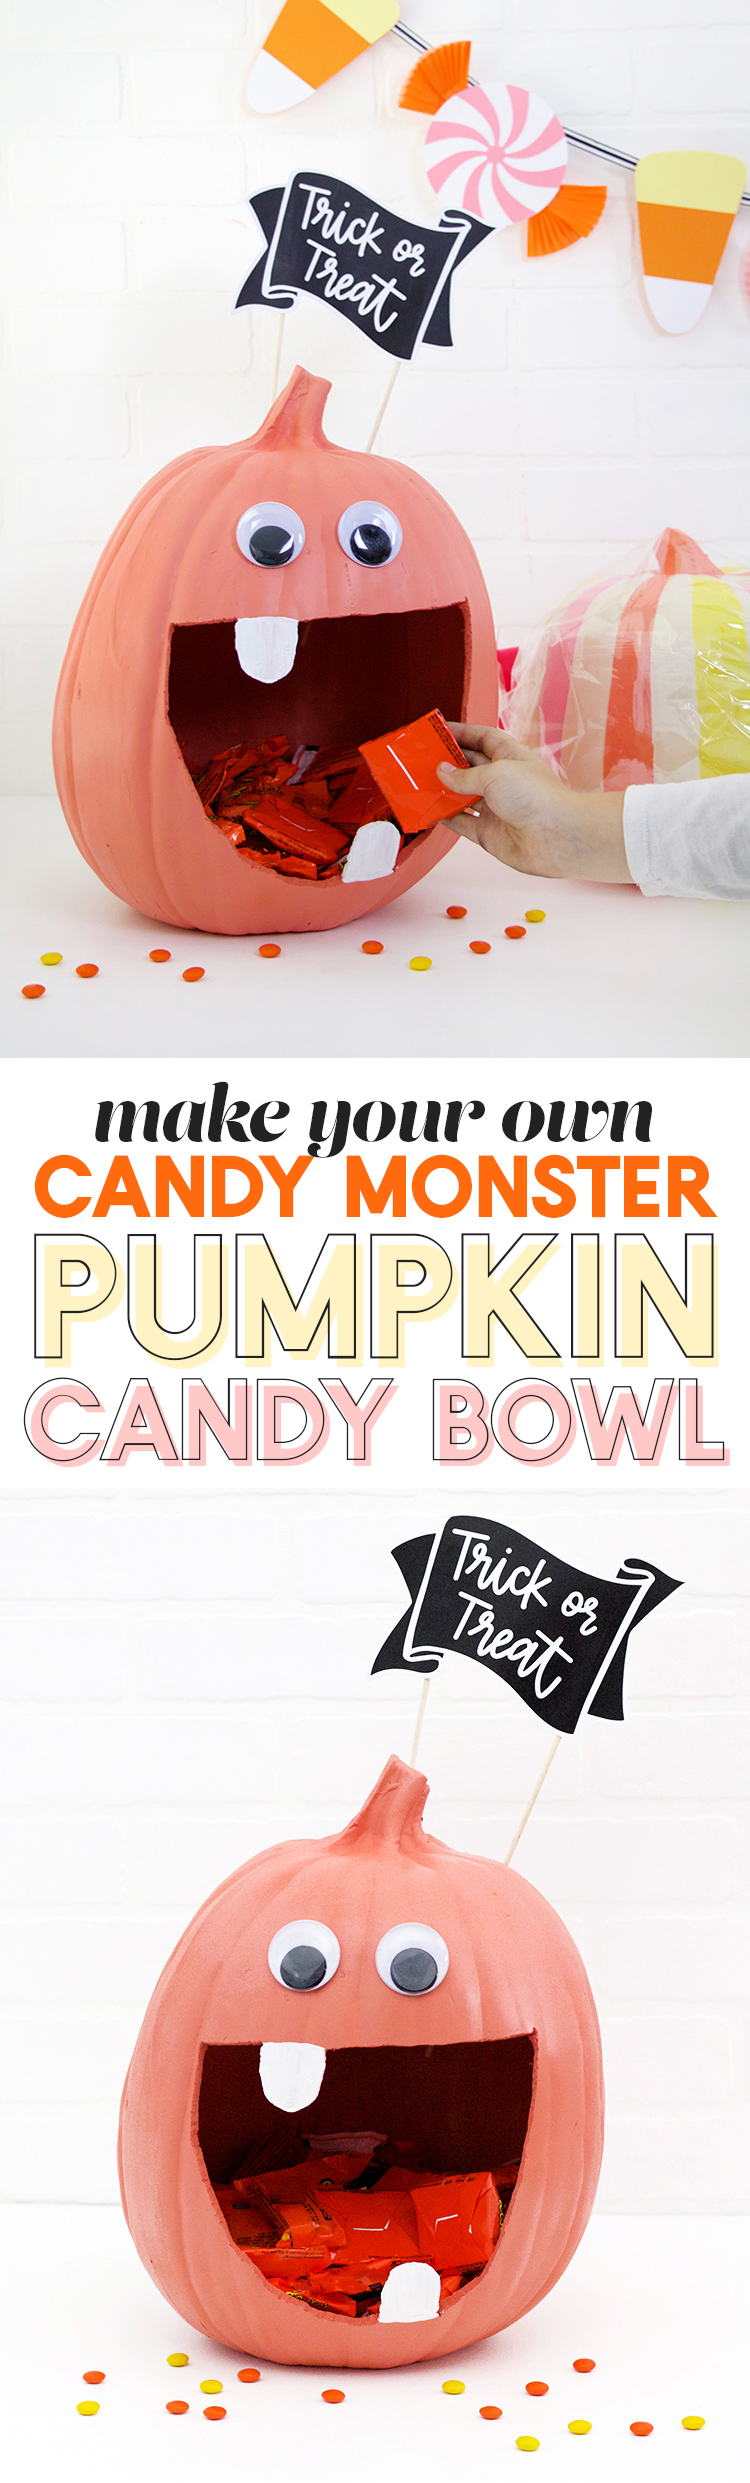 how to make a cute candy monster diy pumpkin candy bowl